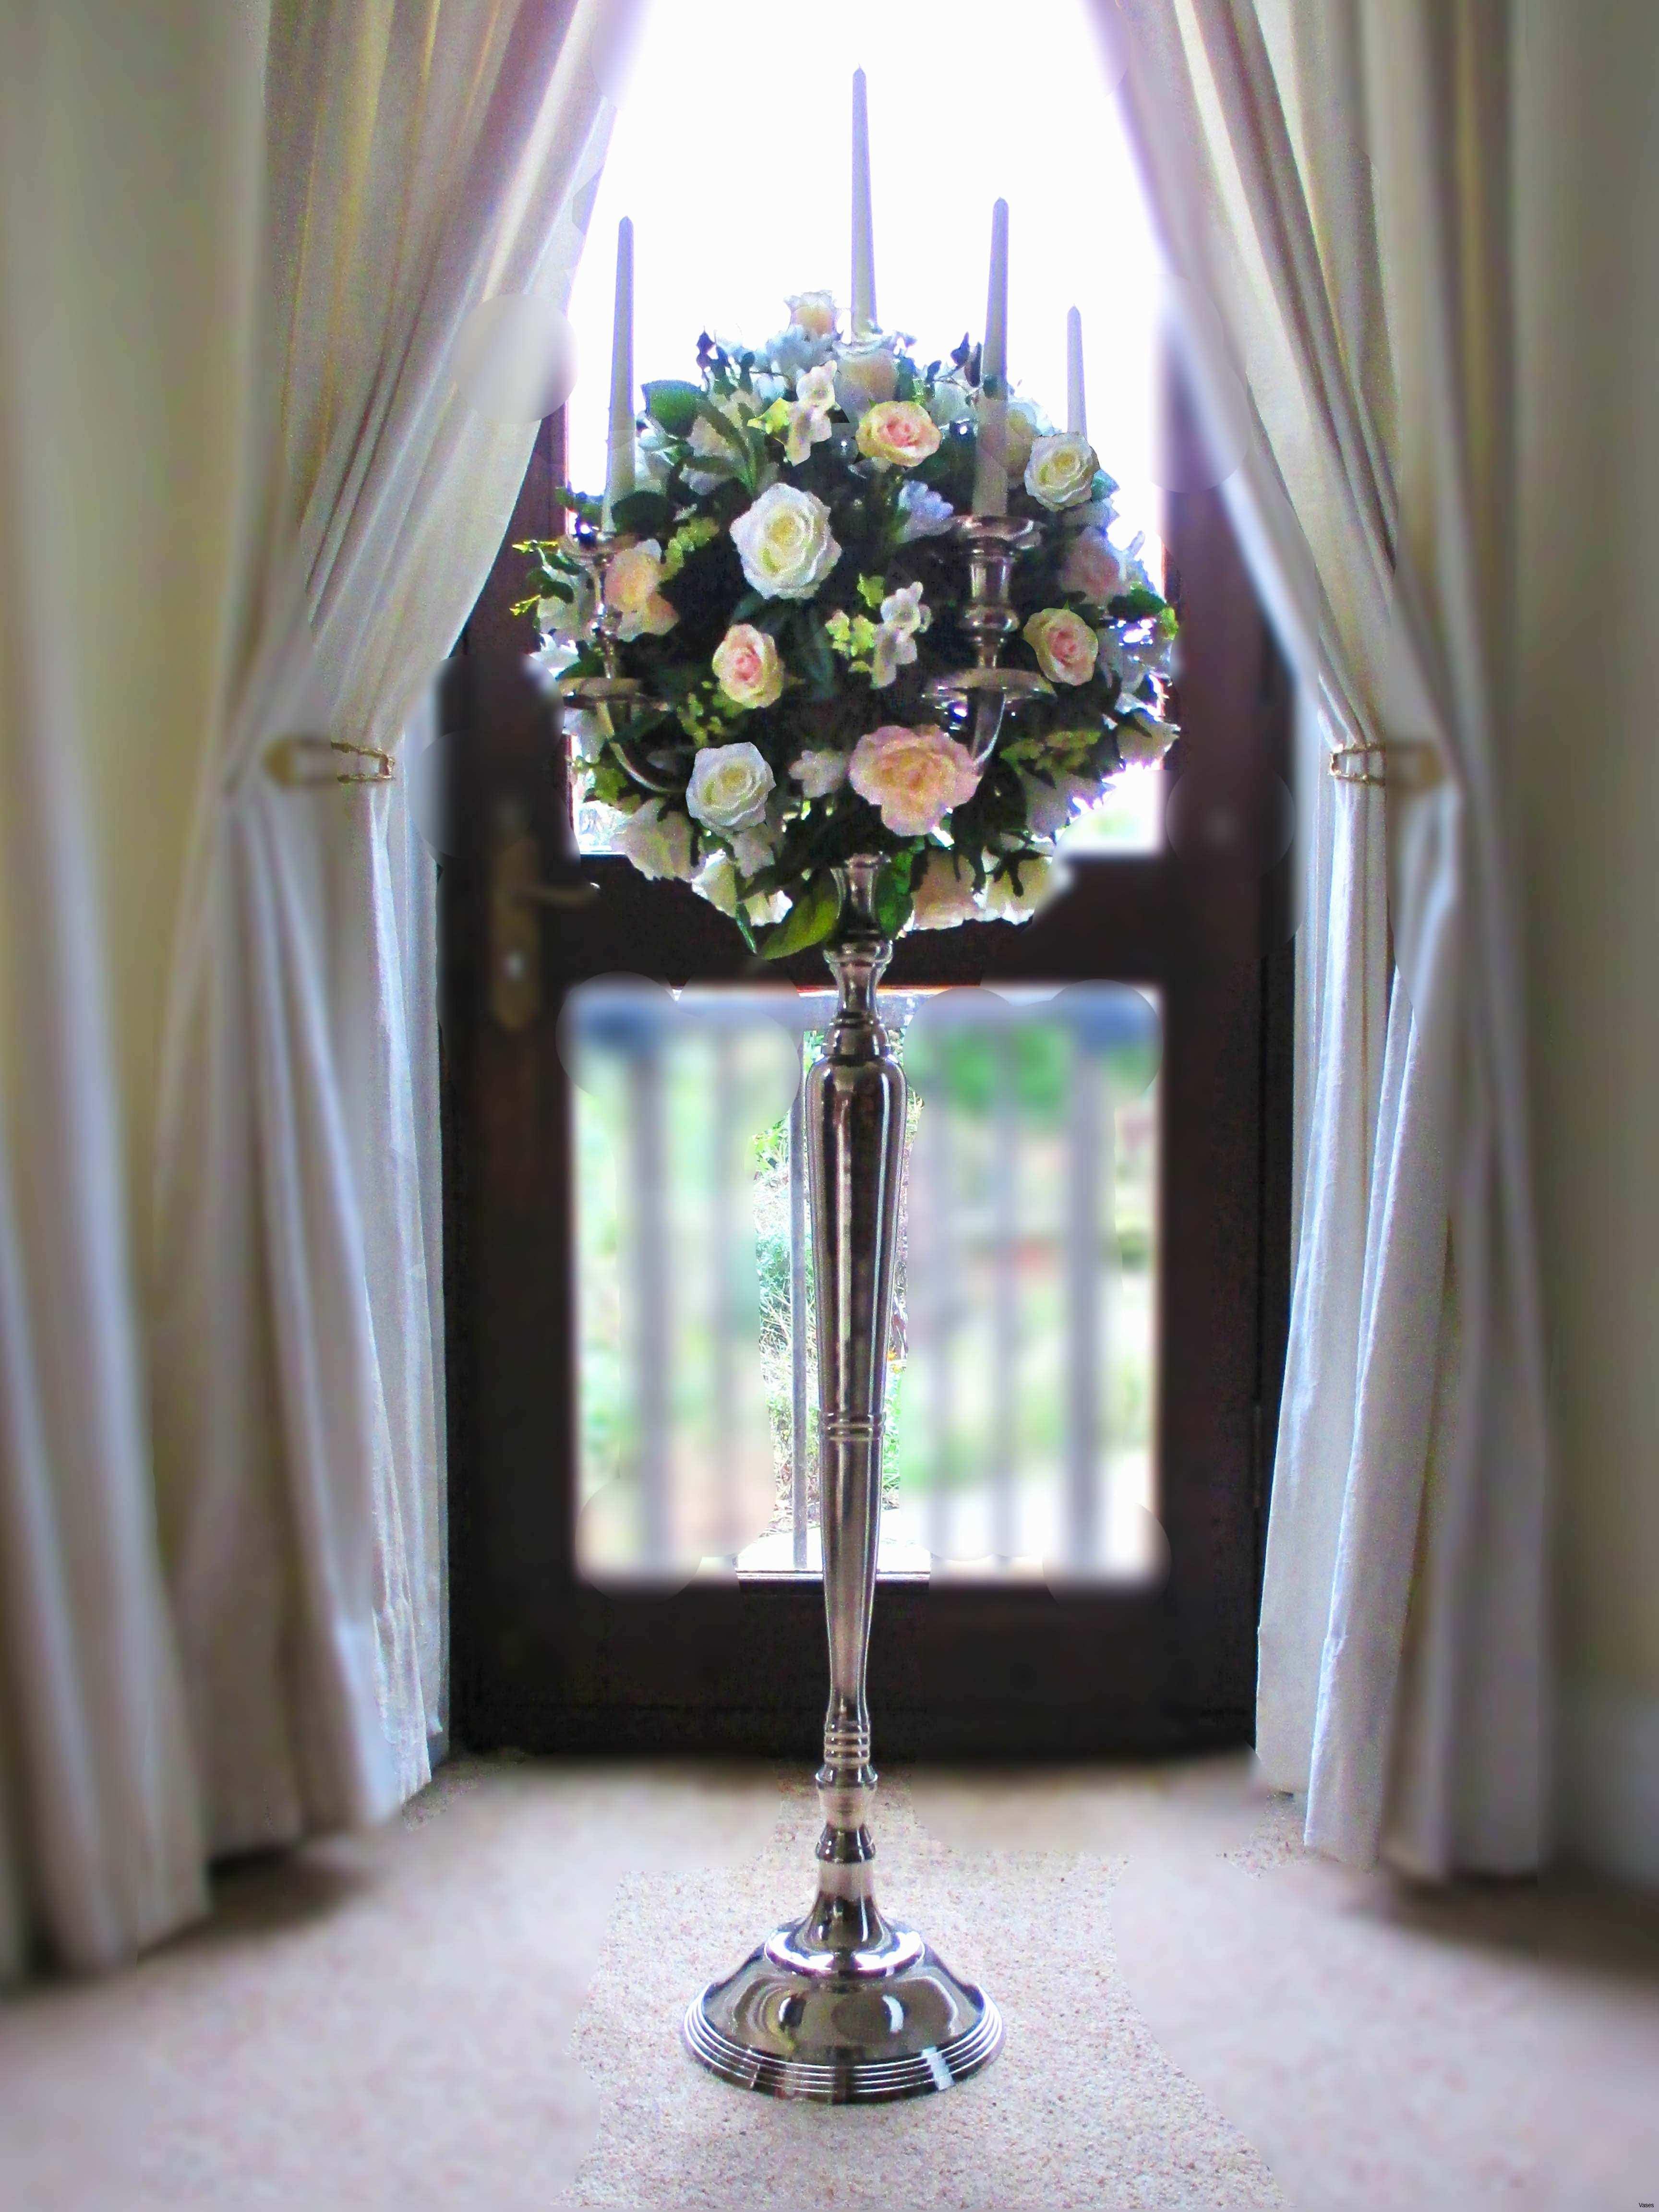 cotton for vases of 22 elegant shower curtain flowers curtain set curtain set in fabric shower curtain a· shower curtain flowers beautiful cheap wedding bouquets packages 5397h vases silver vase leeds i 0d